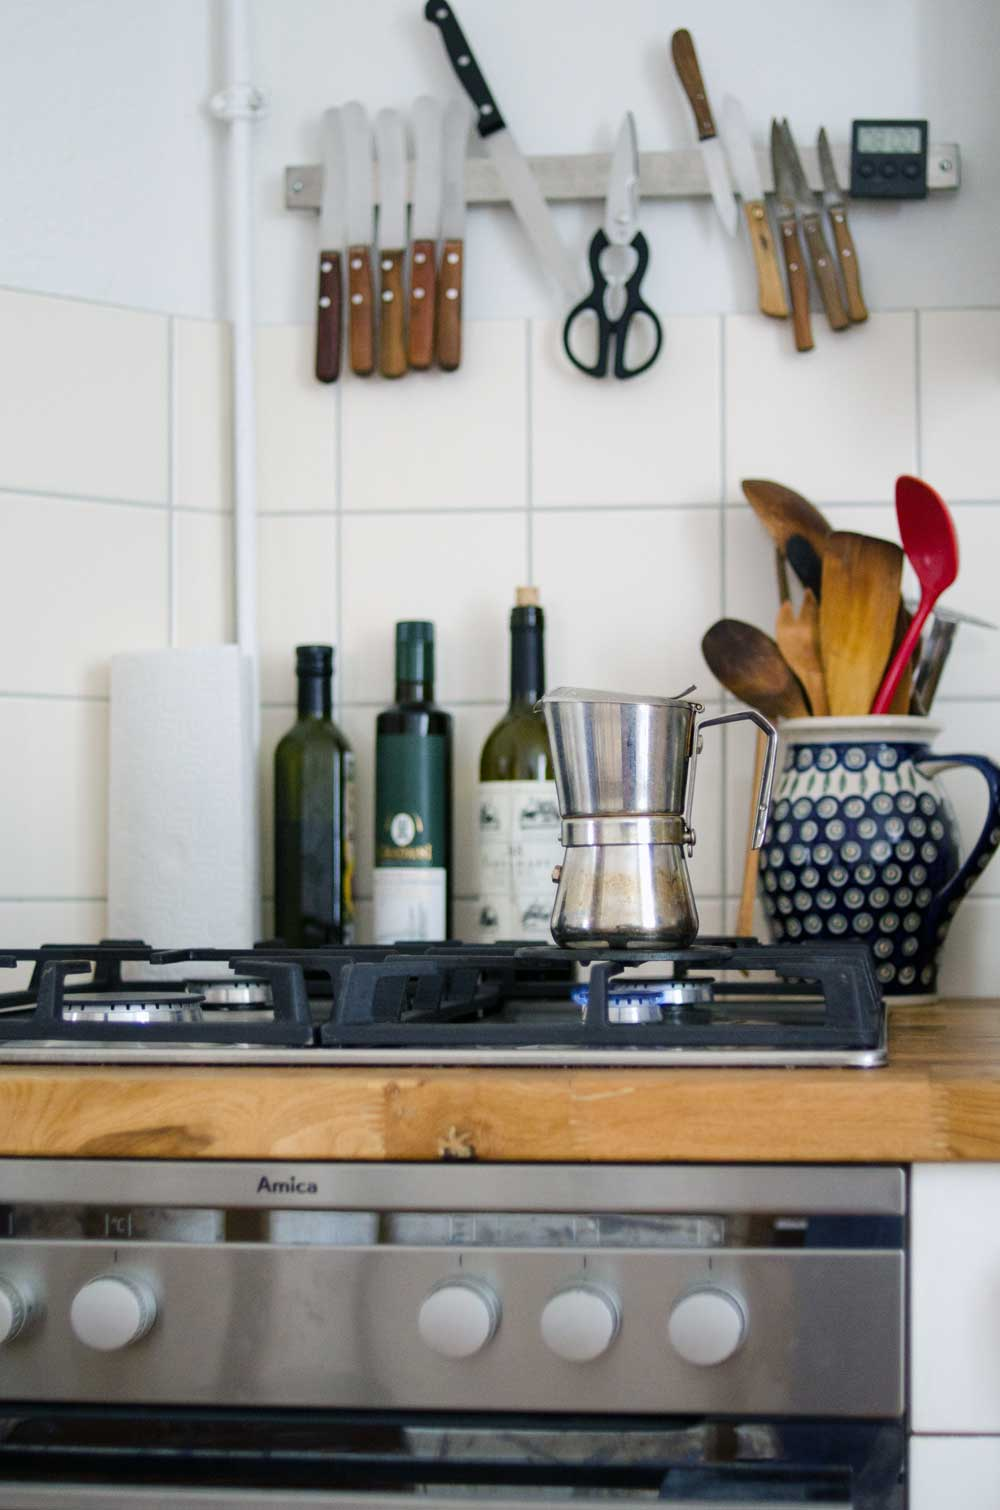 Küche Diana Laube, Homestory hamburgvoninnen.de, Espresso!